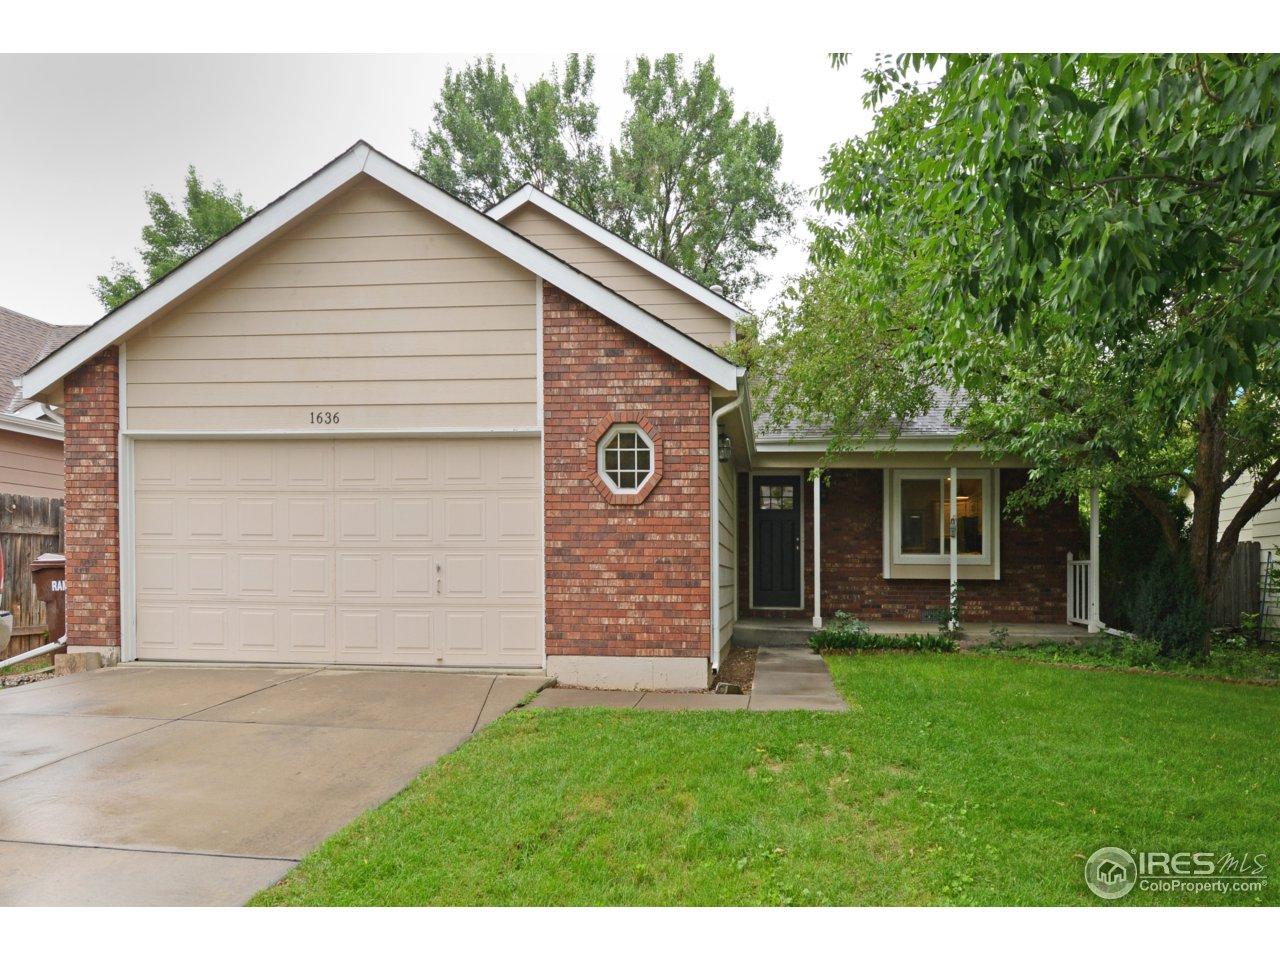 Charming $439,900. 1636 Dogwood Ct, Fort Collins ...